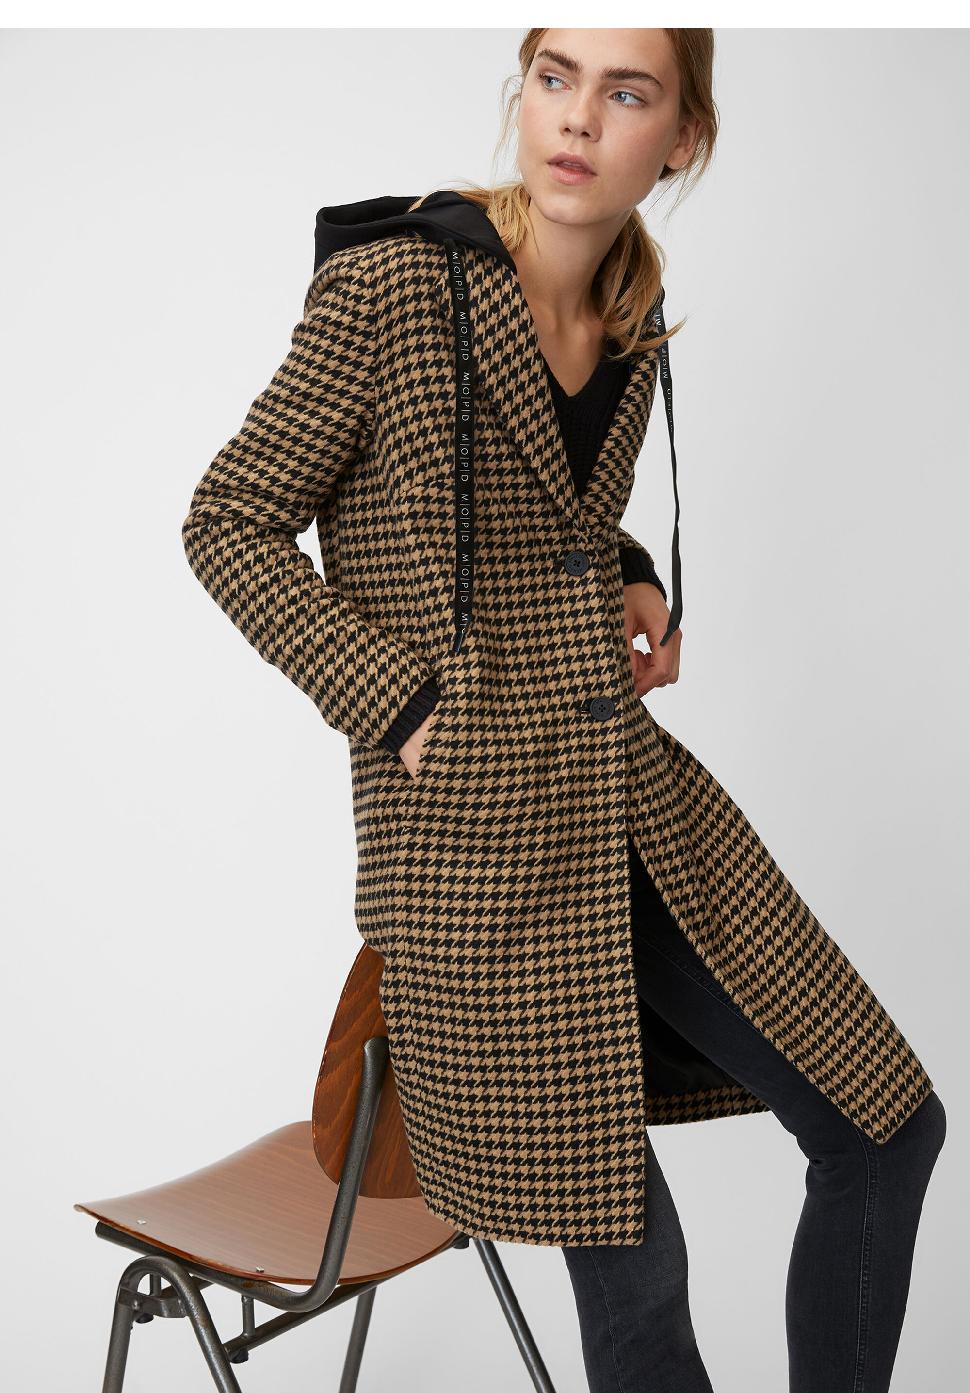 fashion_alexandra_batke_17